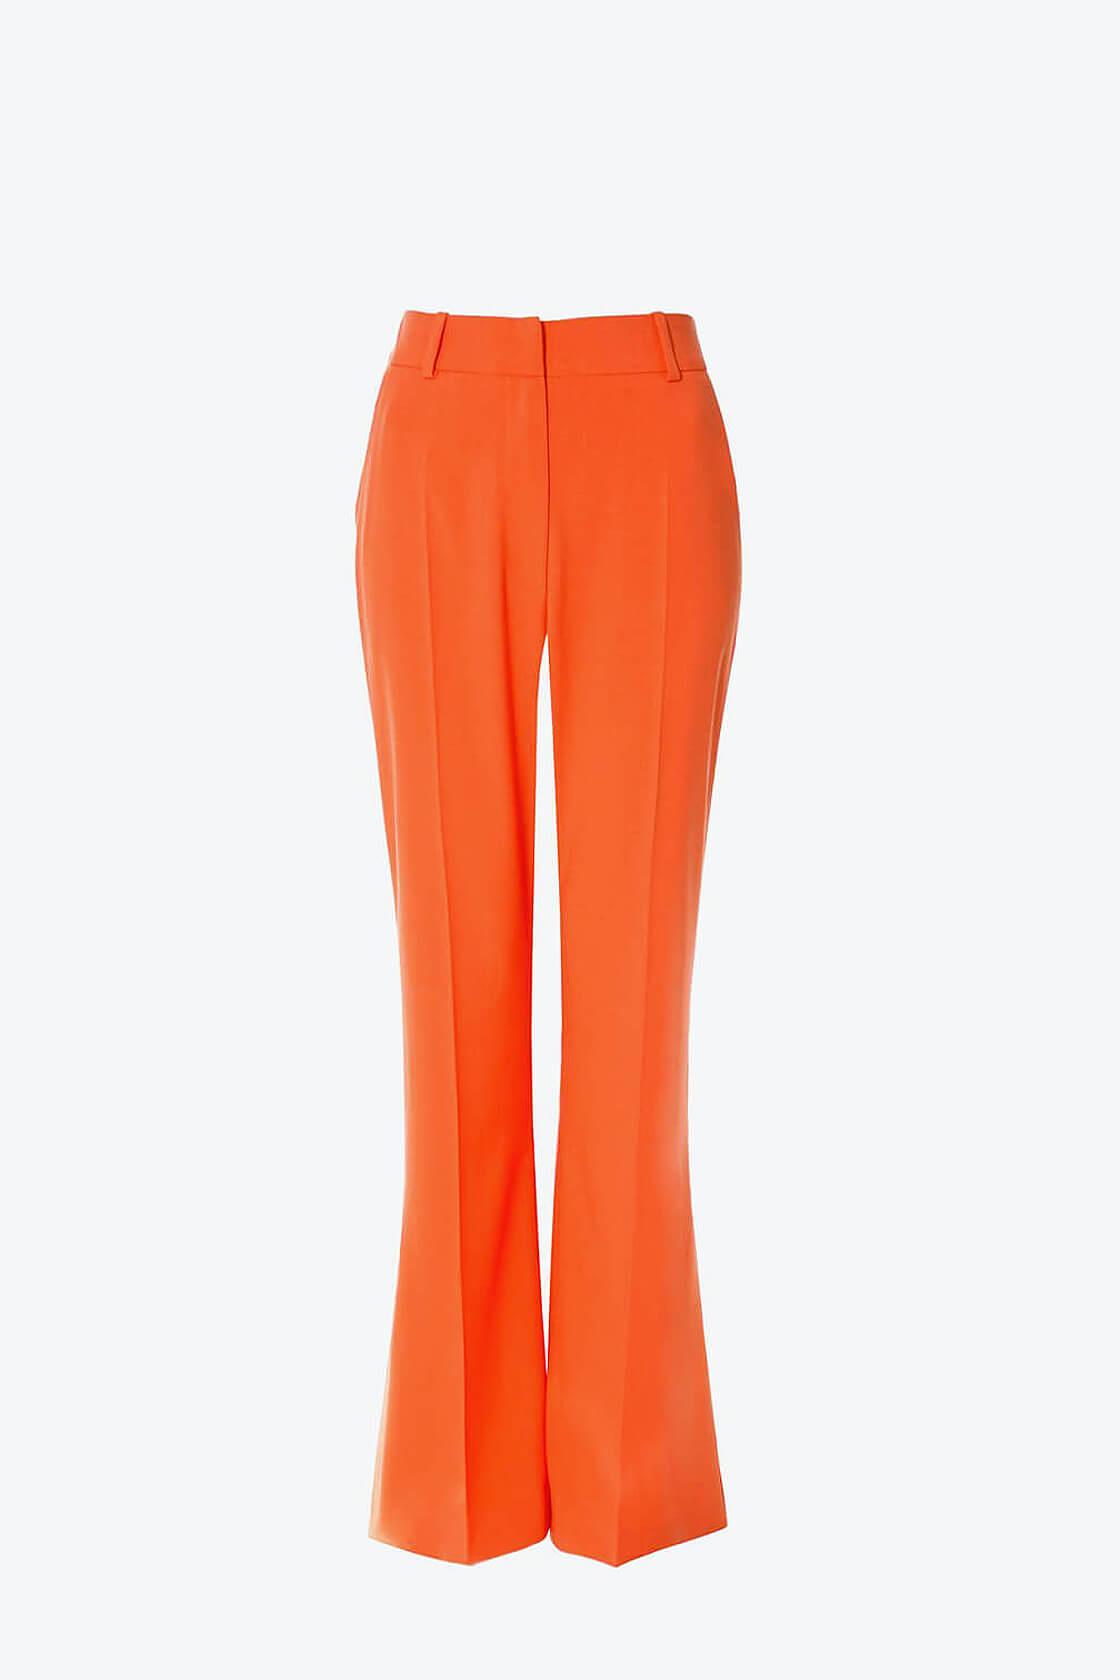 OL100002582 Pants Camilla Tangerine1